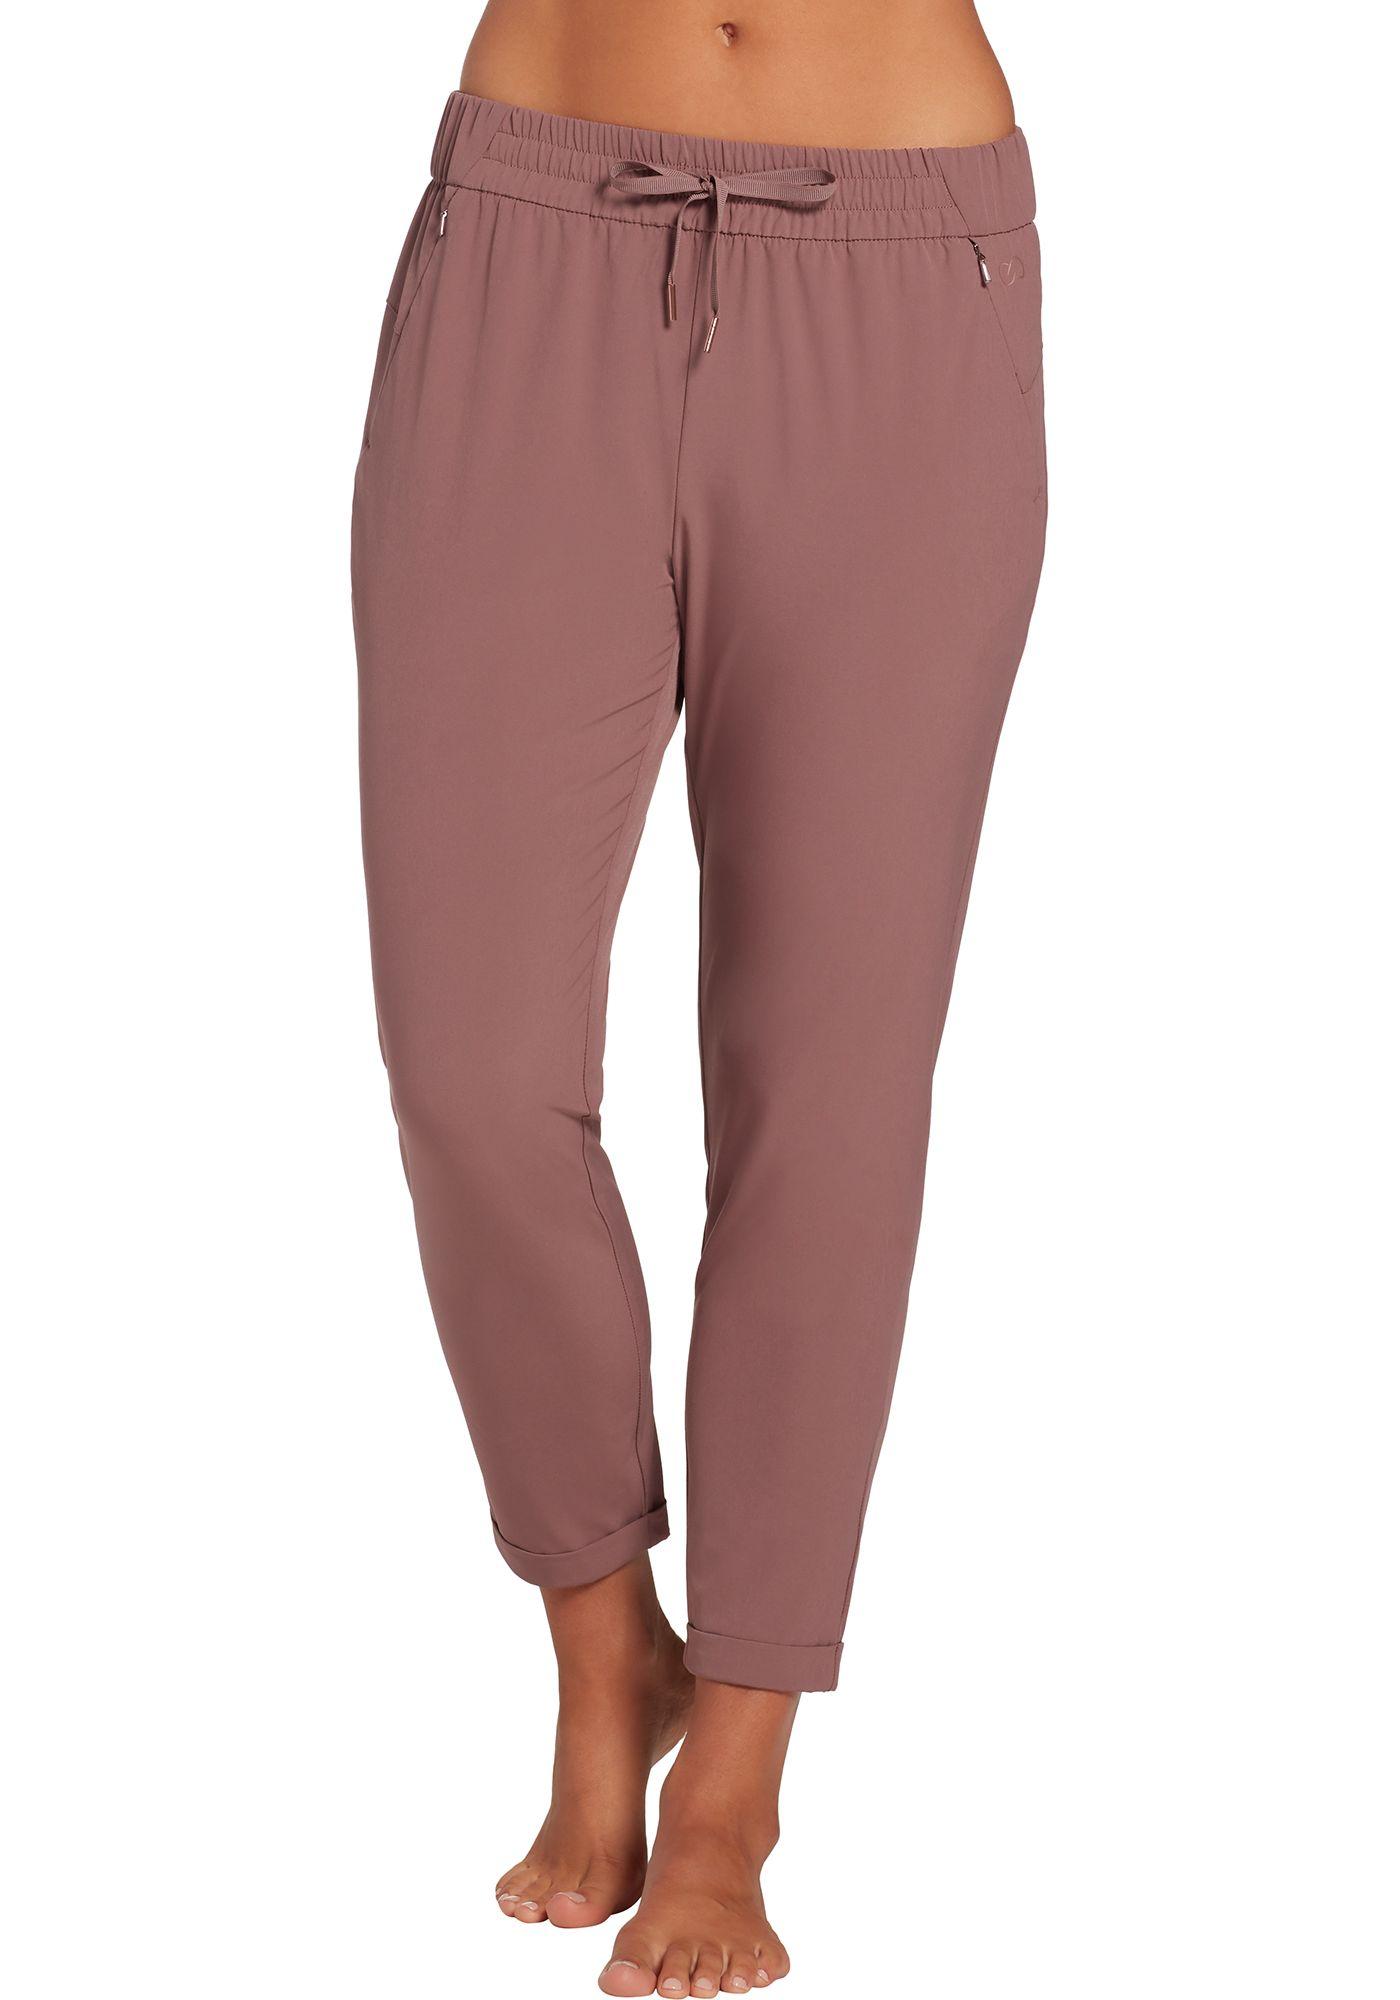 CALIA by Carrie Underwood Women's Journey Woven Pants